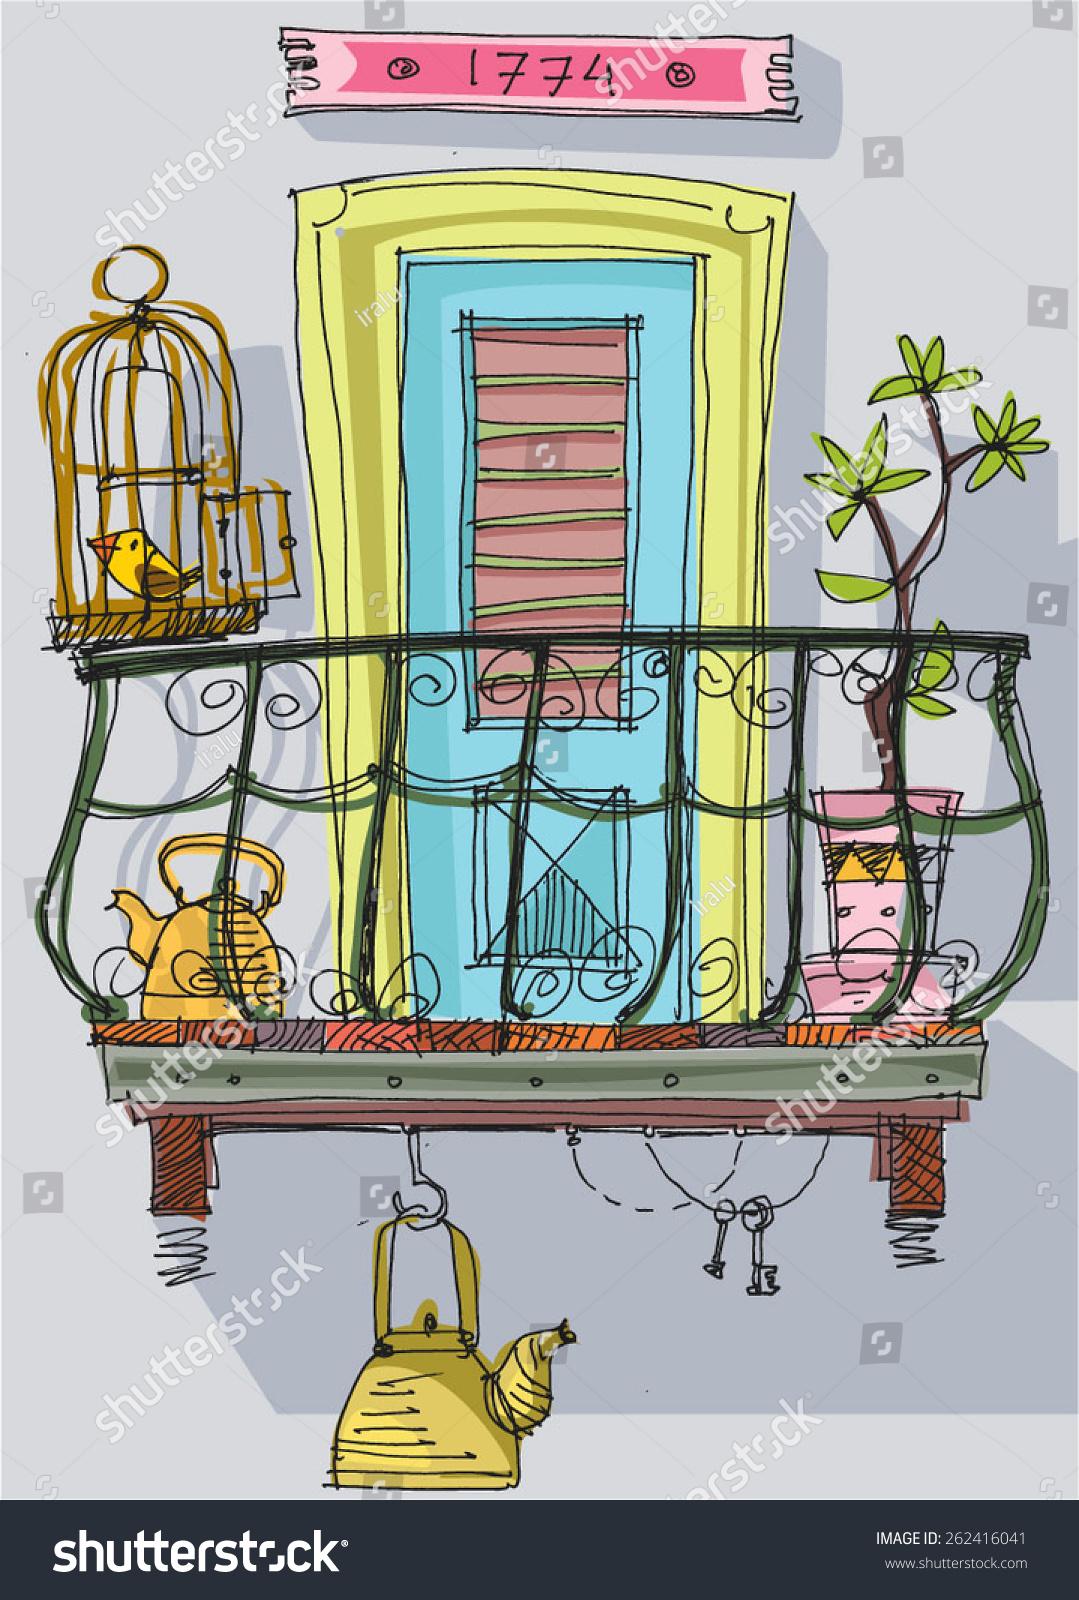 Cute Balcony Cartoon Stock Vector 262416041 Shutterstock